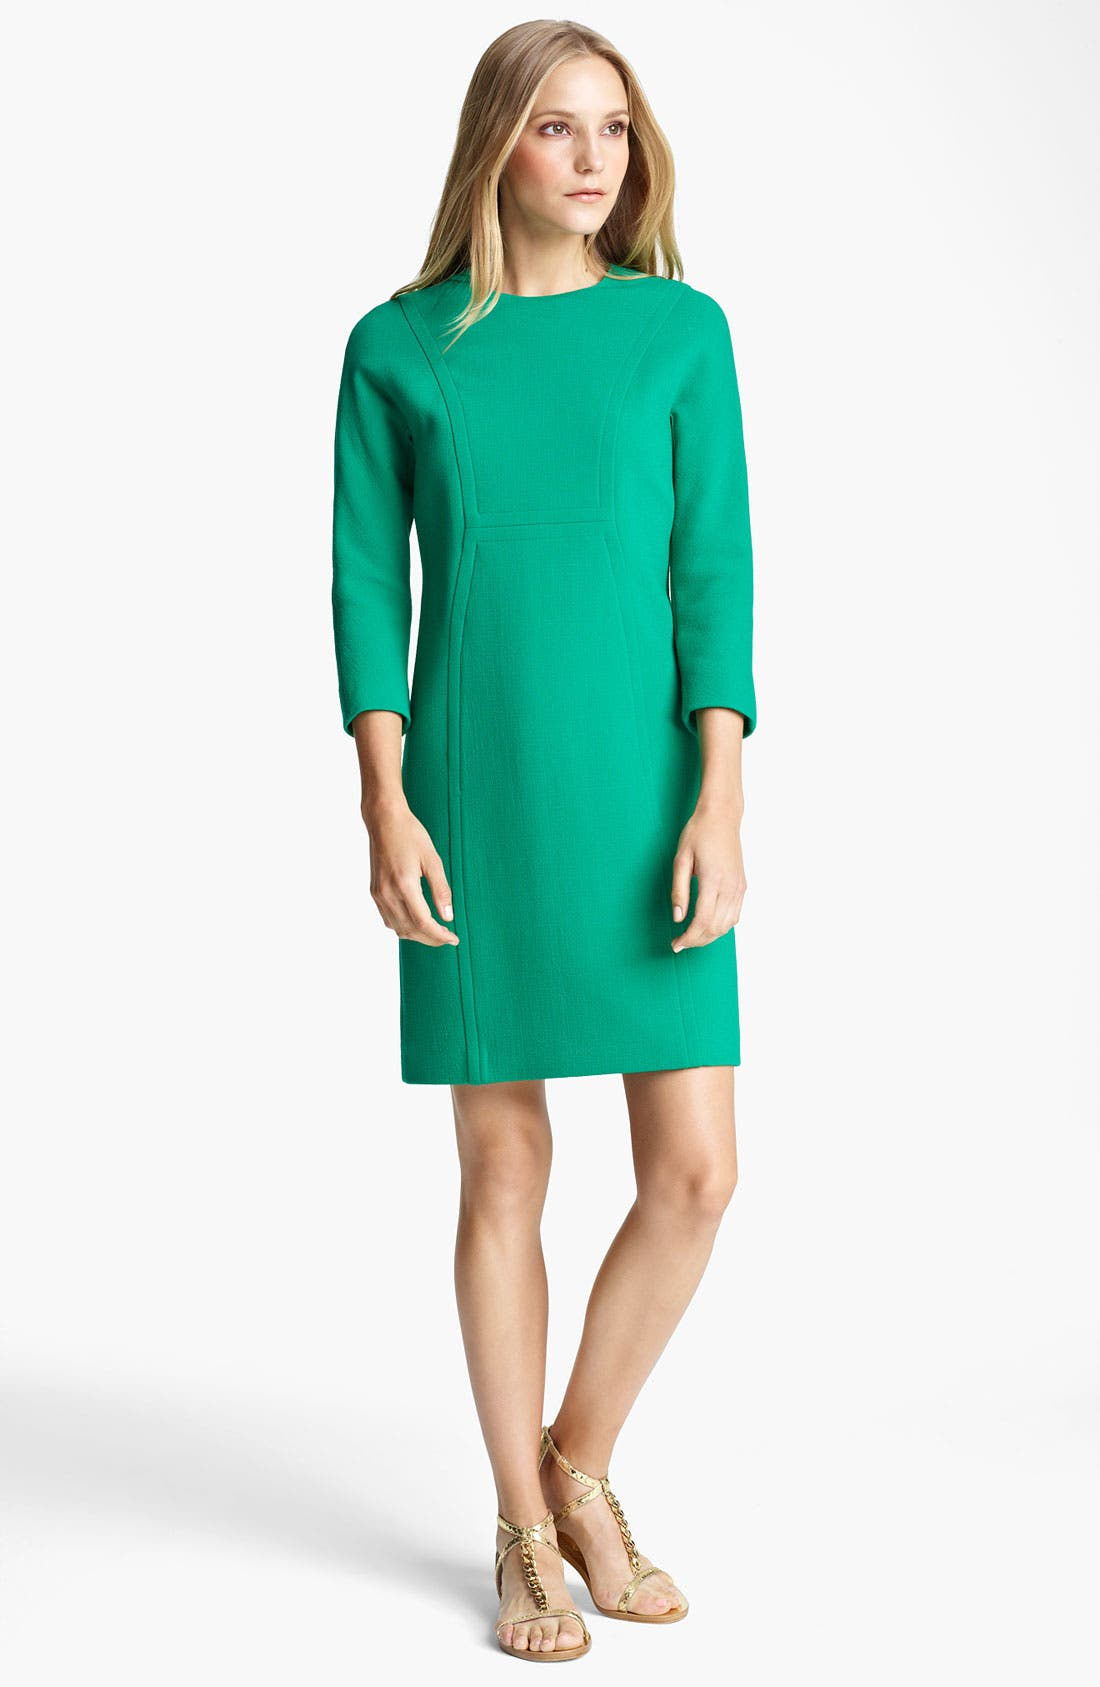 Main Image - Michael Kors Bouclé Crepe Shift Dress